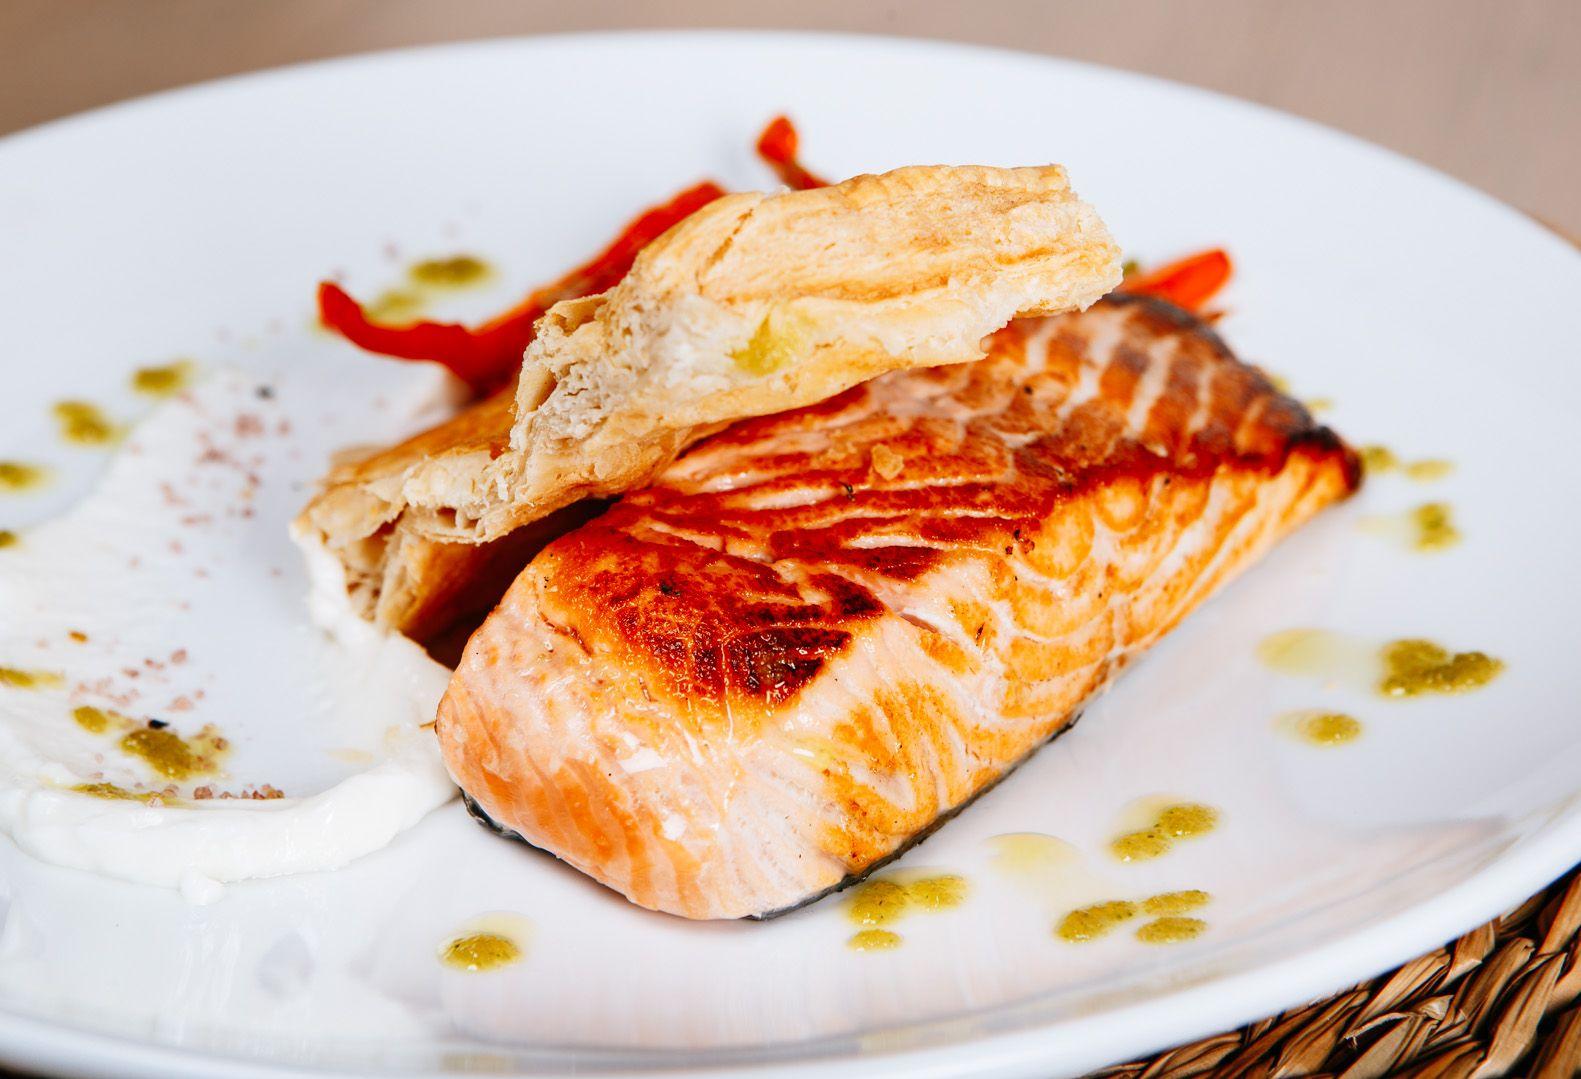 Comer pescado fresco de calidad en Mérida